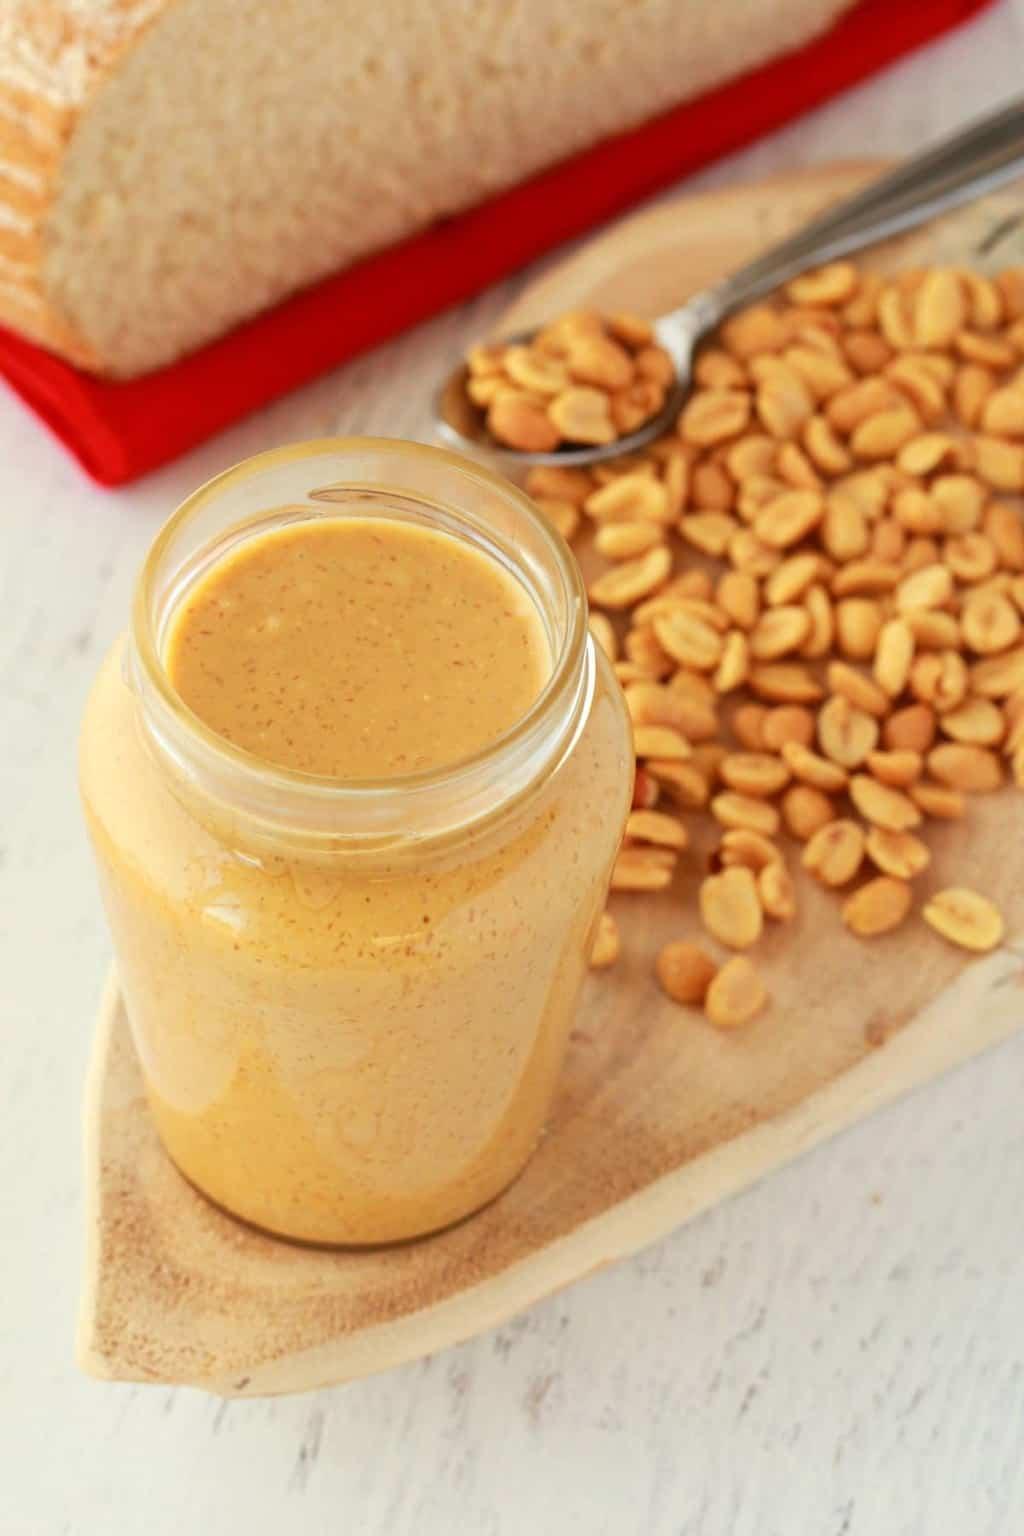 Homemade Peanut Butter - Loving It Vegan